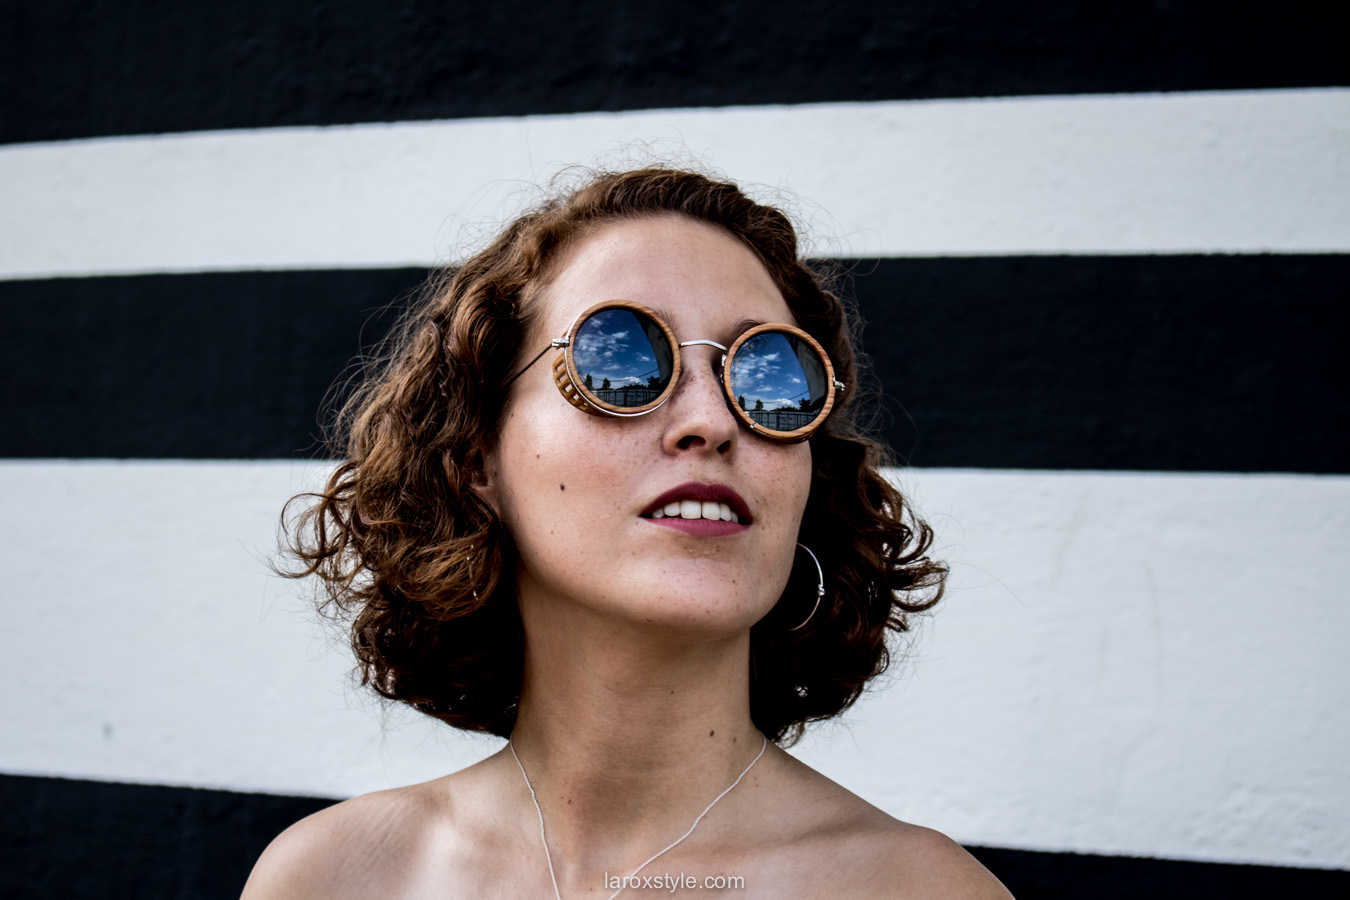 lunettes rondes - tendance mode - blog mode lyon